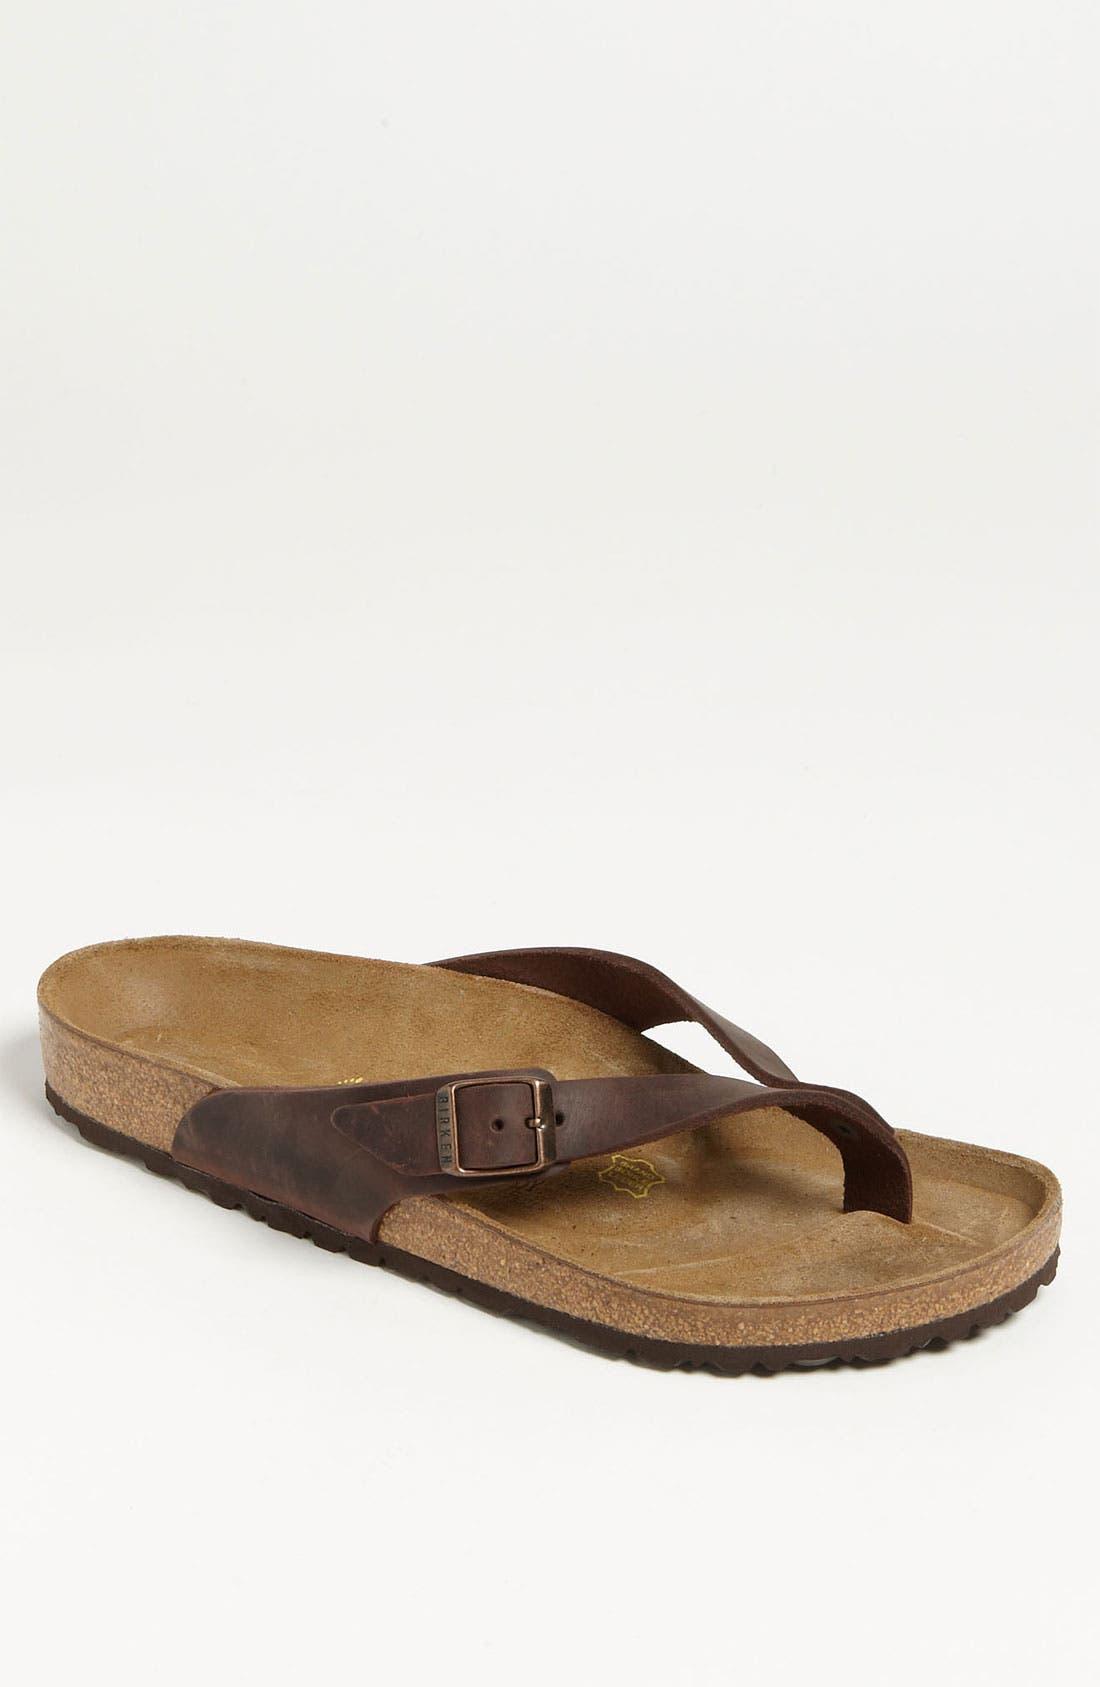 Main Image - Birkenstock 'Adria' Sandal (Men)